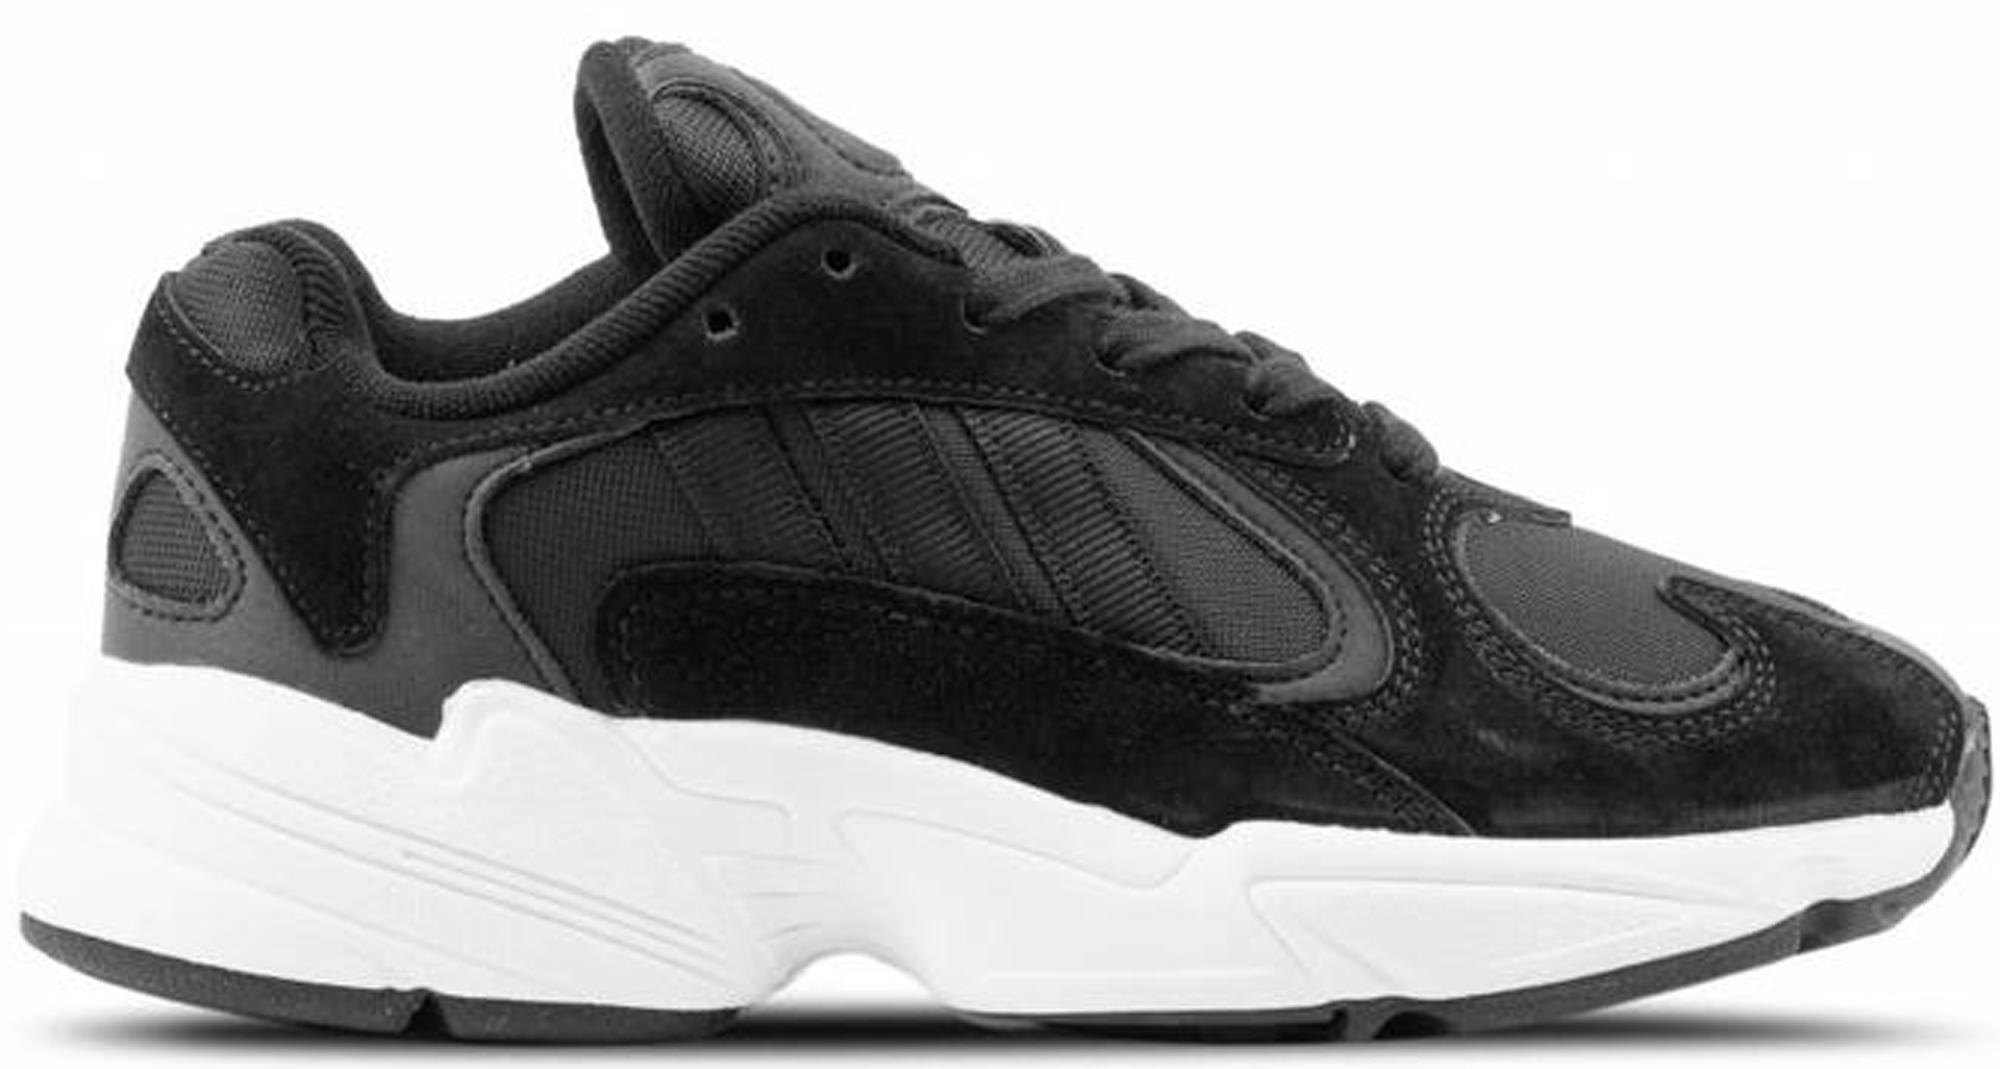 adidas Yung-1 Black White